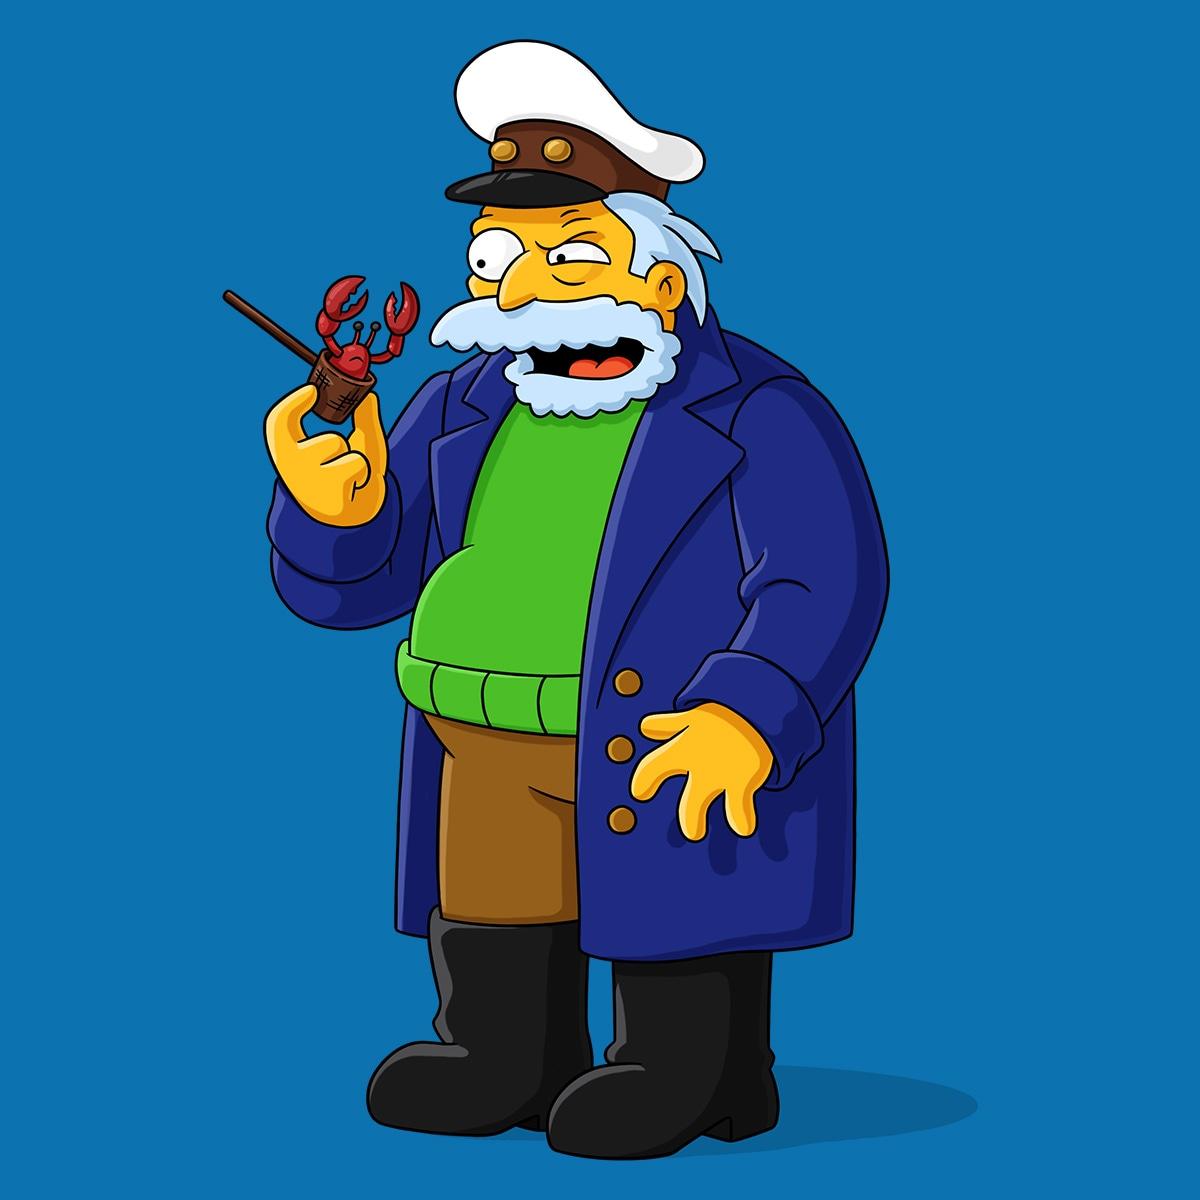 Old Sea Captain | Simpsons World on FXX